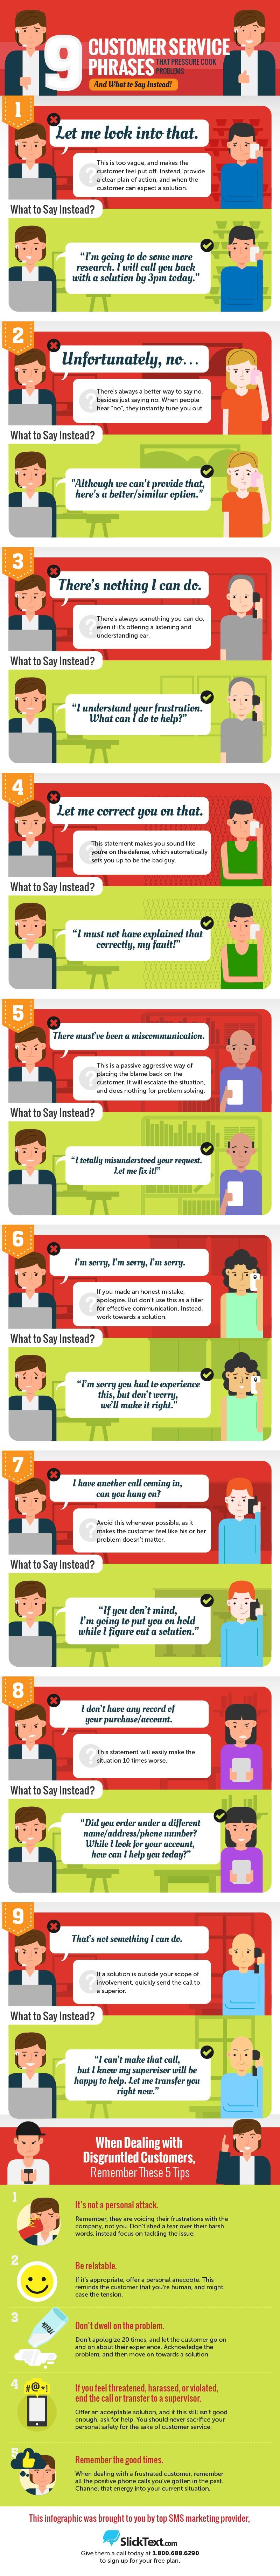 customer_service_phrases_to_avoid.jpg